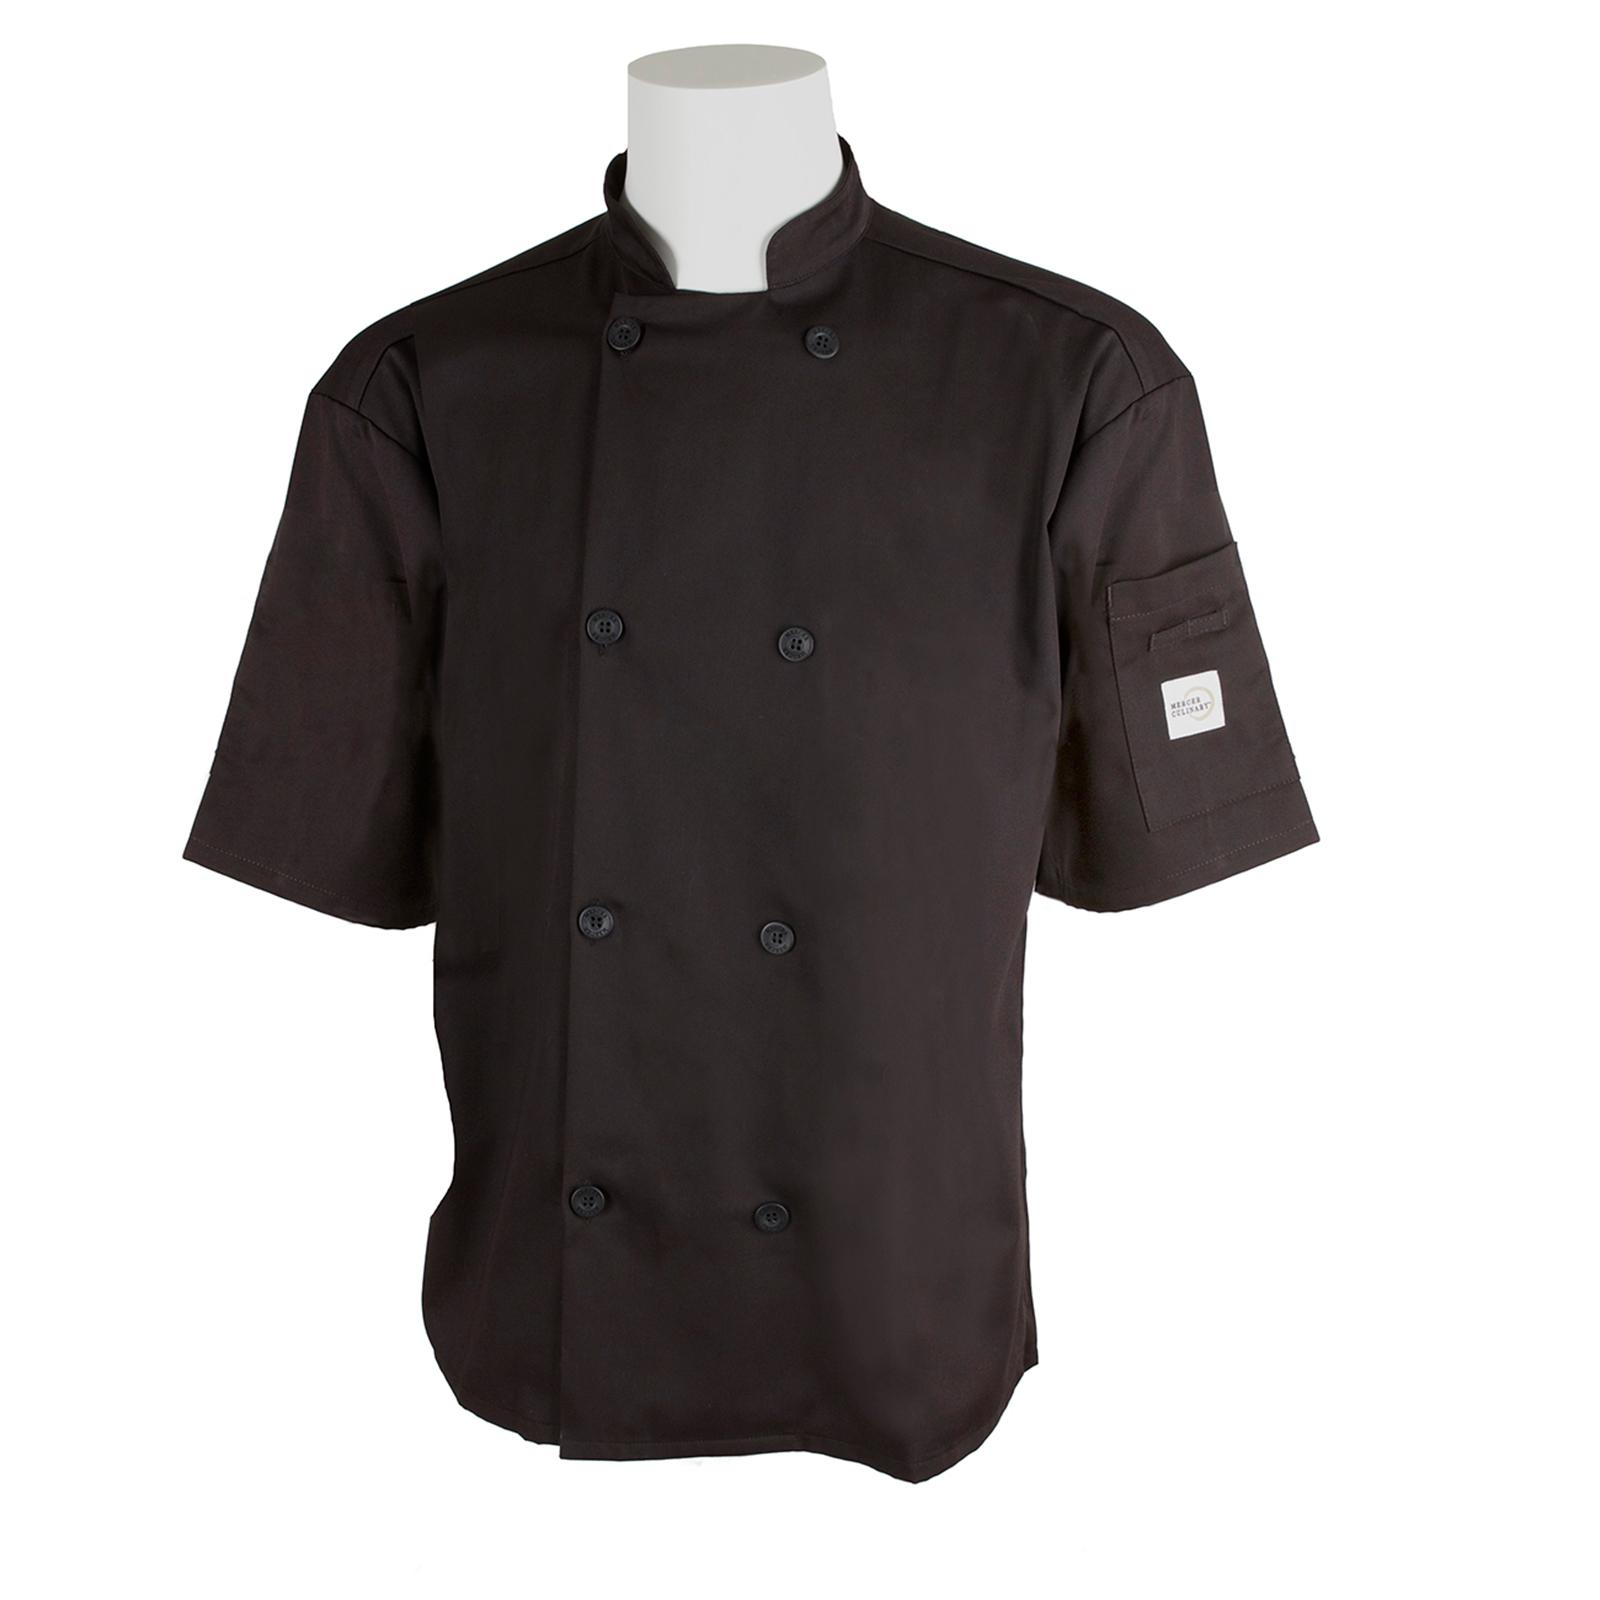 Mercer Culinary M60019BKM chef's coat